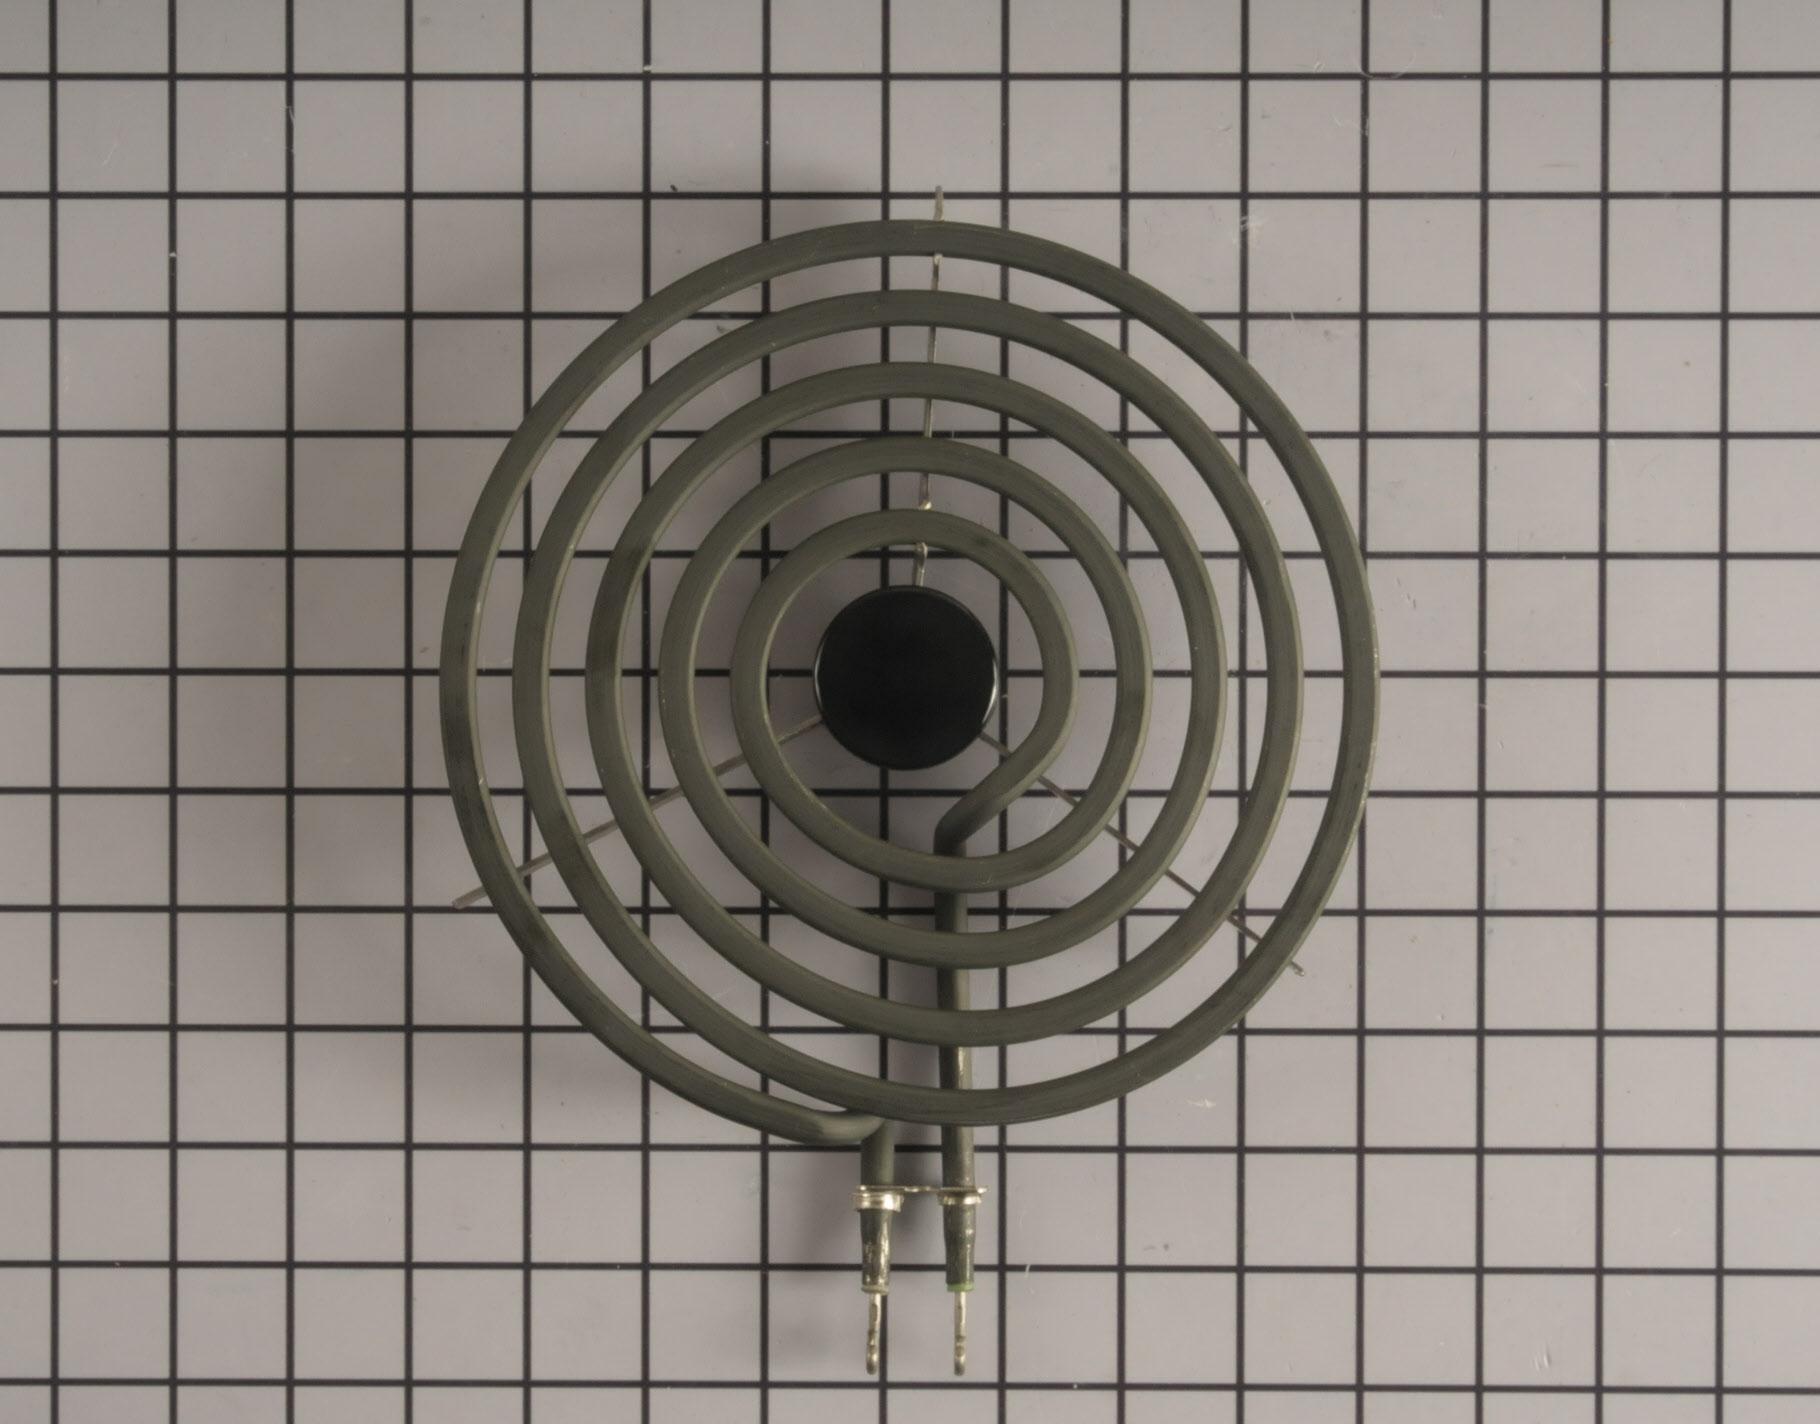 WP660533 KitchenAid Range Stove Oven Part -Coil Surface Element